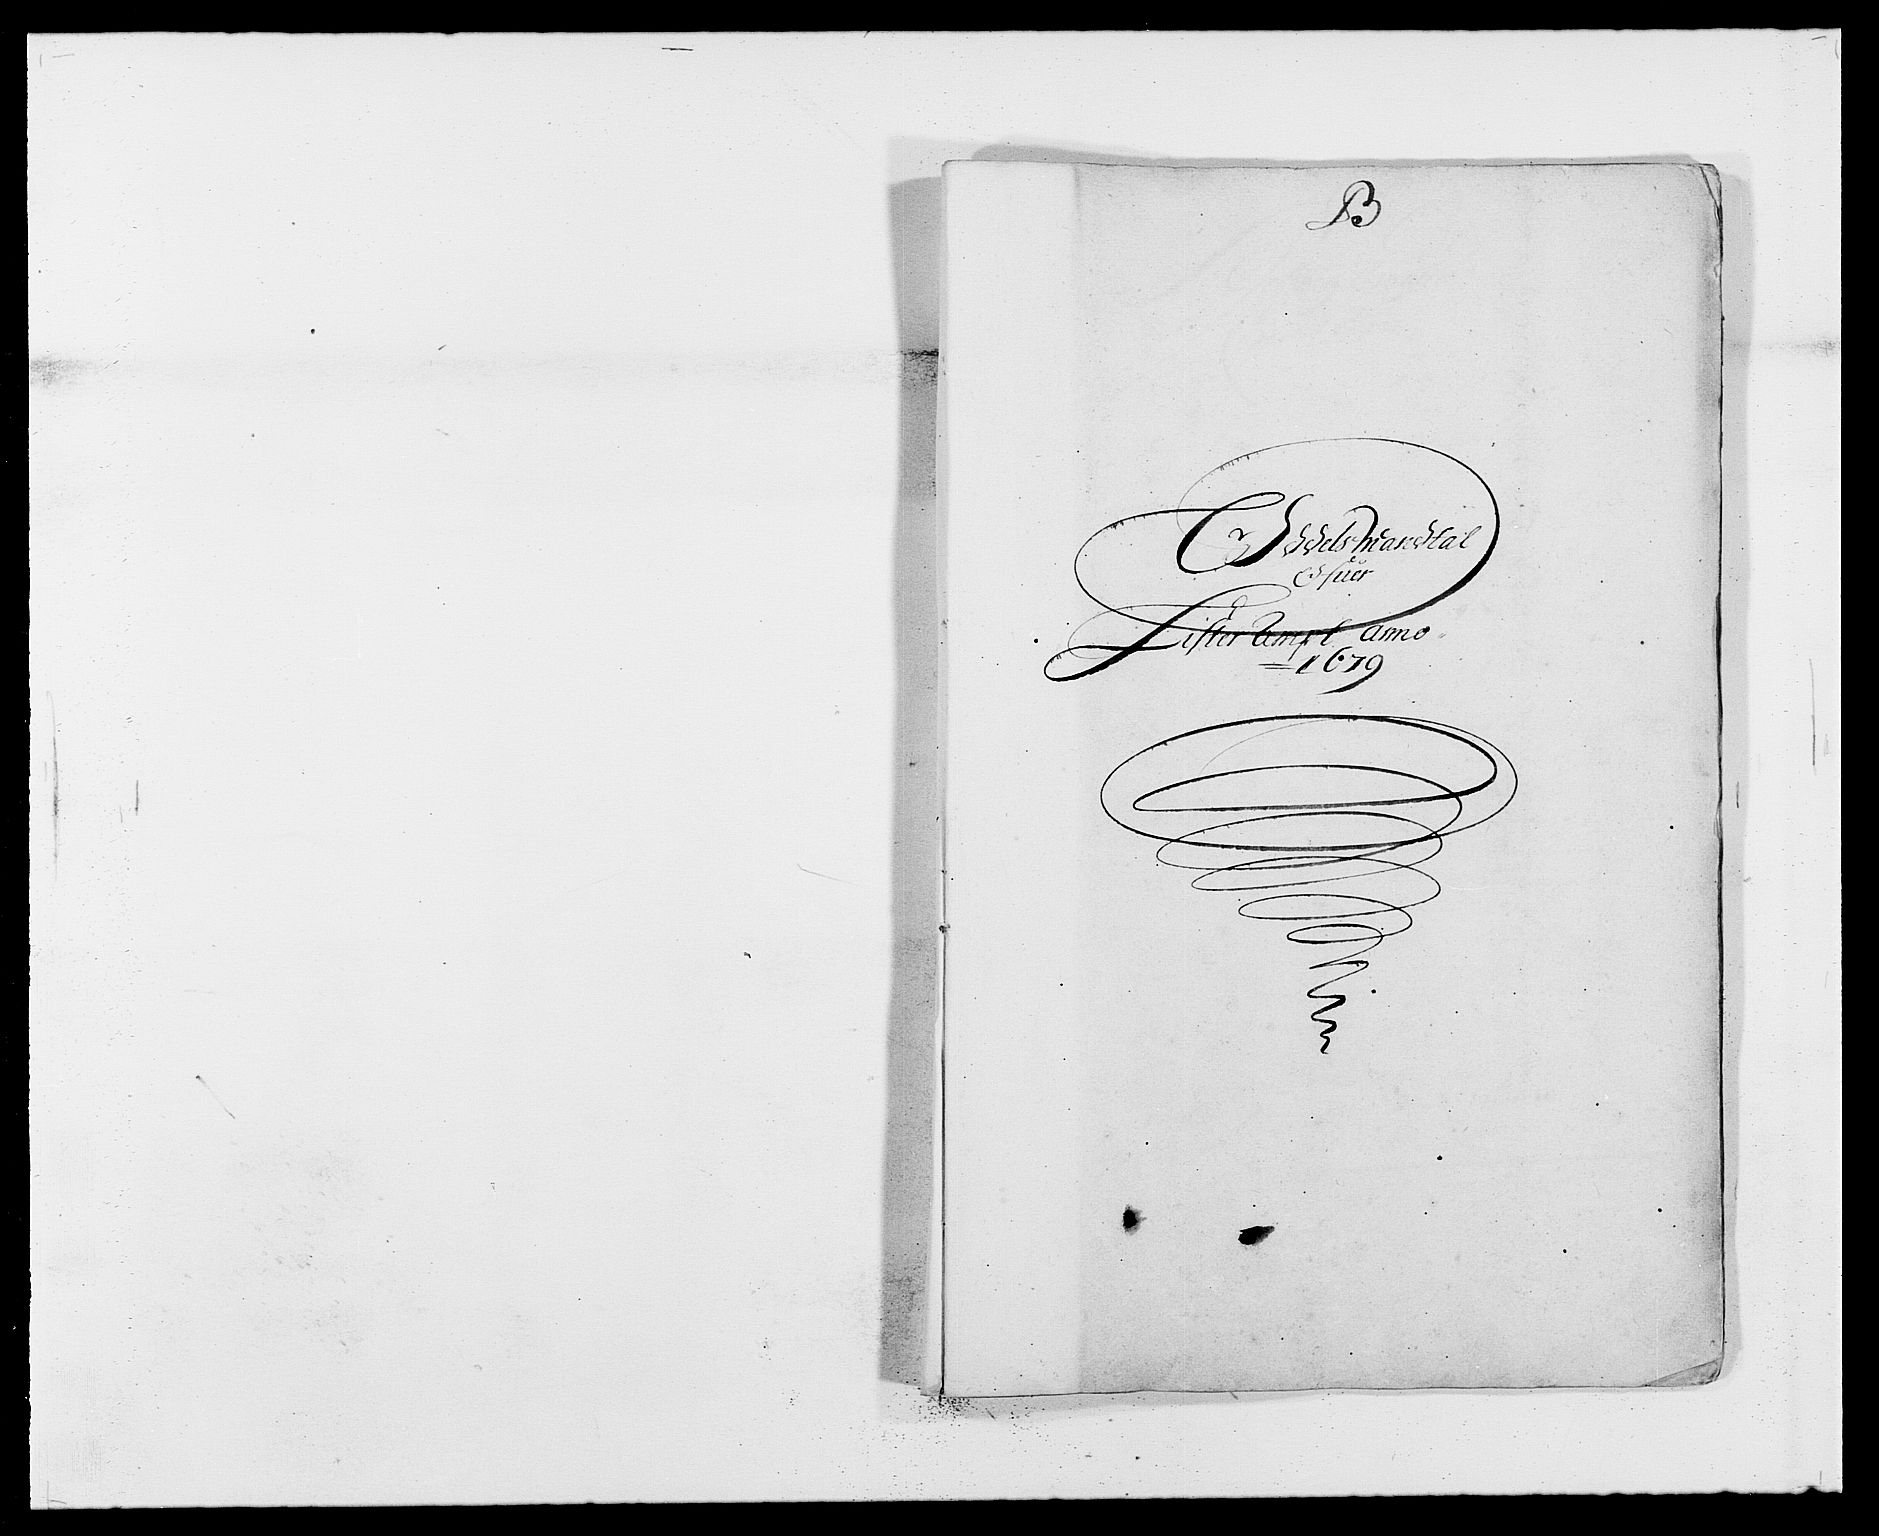 RA, Rentekammeret inntil 1814, Reviderte regnskaper, Fogderegnskap, R41/L2530: Fogderegnskap Lista, 1677-1679, s. 345